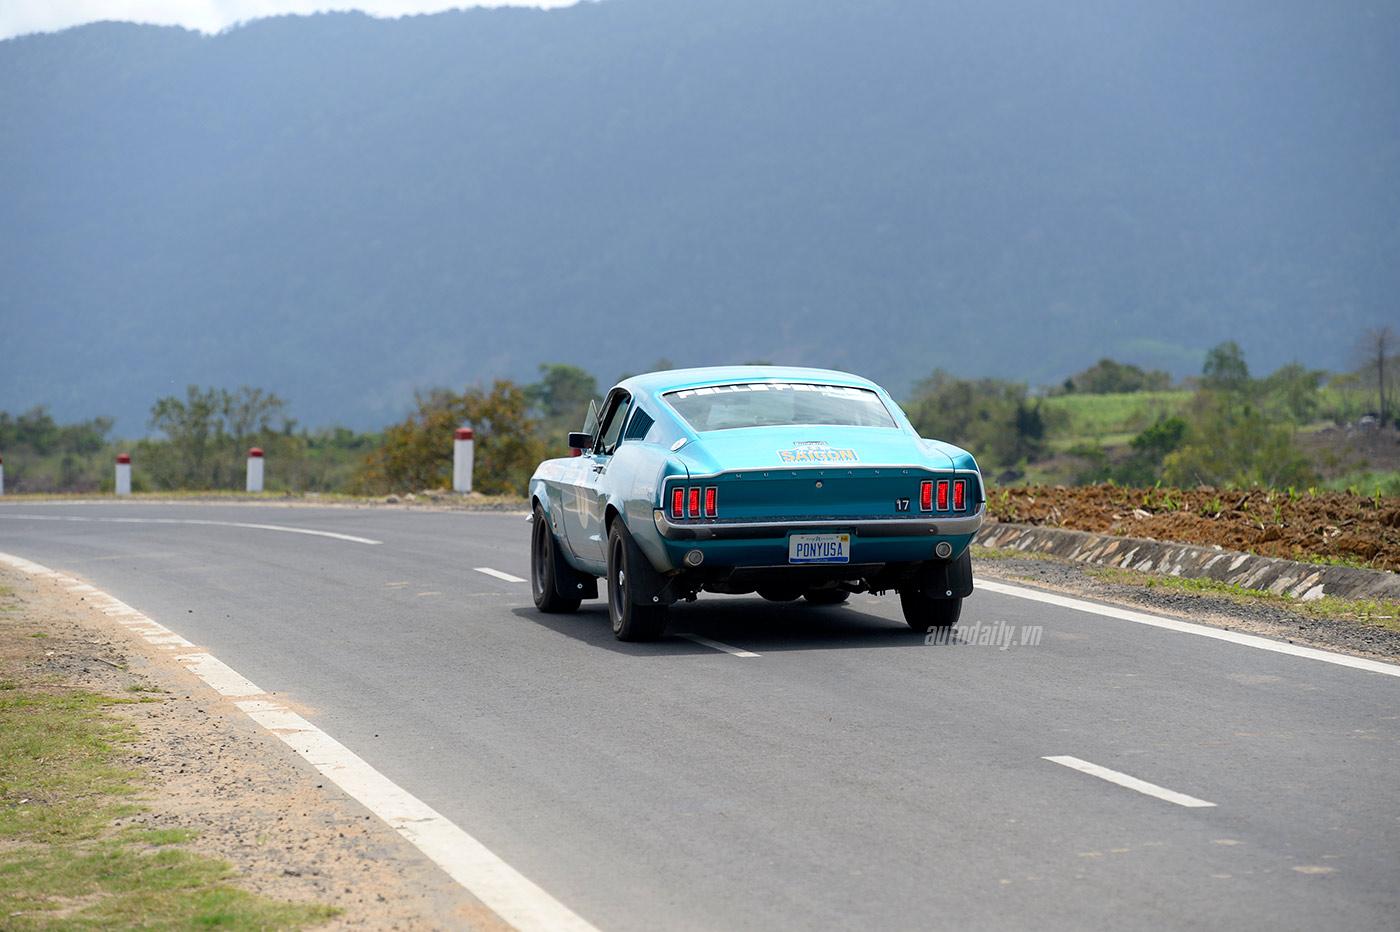 Ford_Mustang_1967.jpg